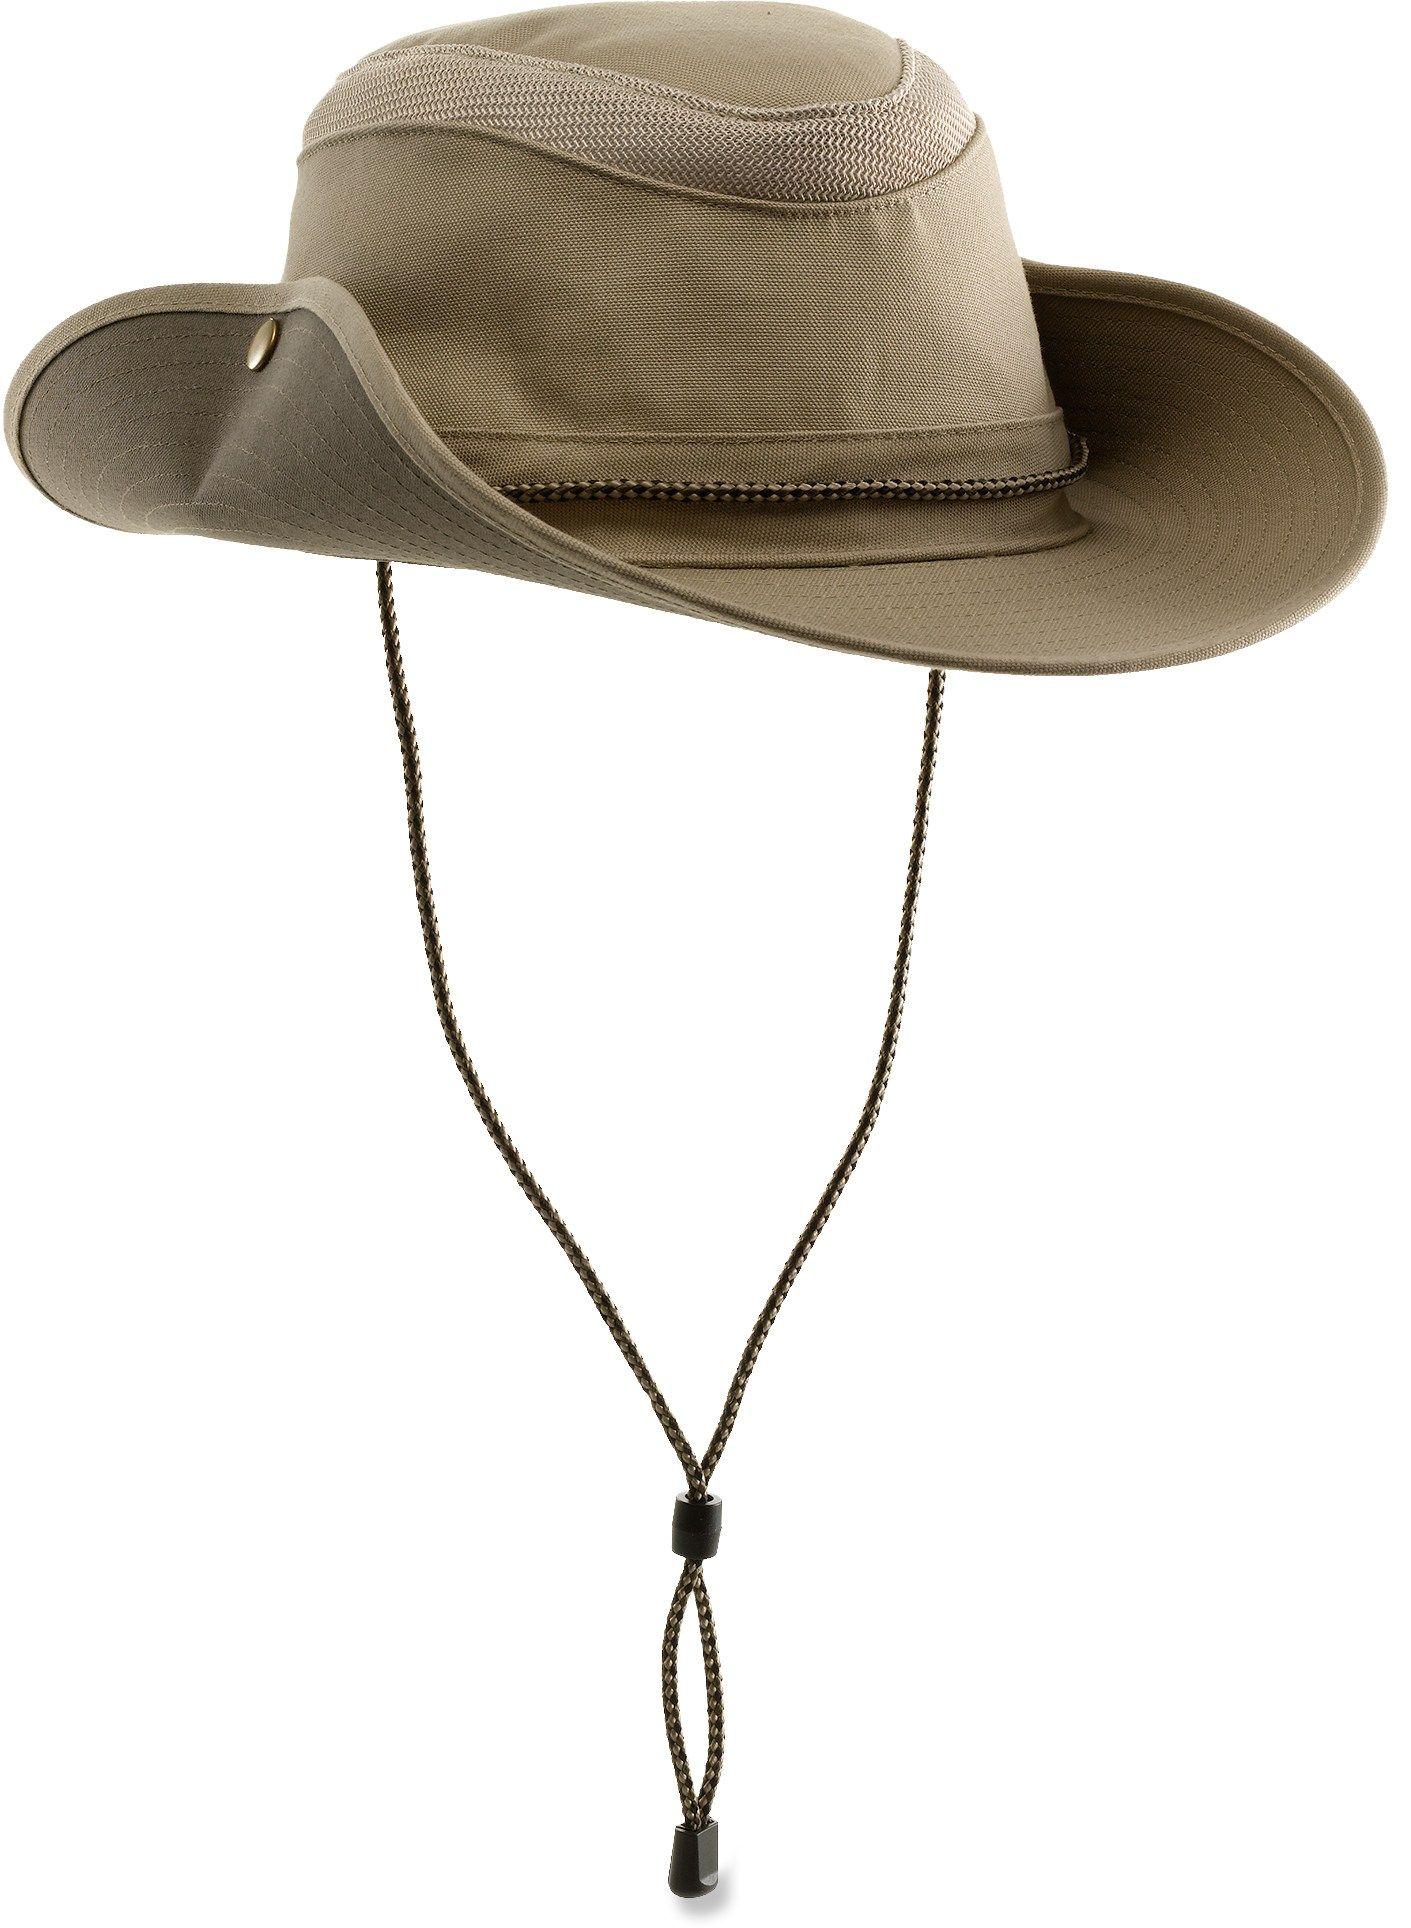 a662ef980a8ac6 REI Vented Explorer Hat at REI.com | STYLE // G E A R | Hats ...